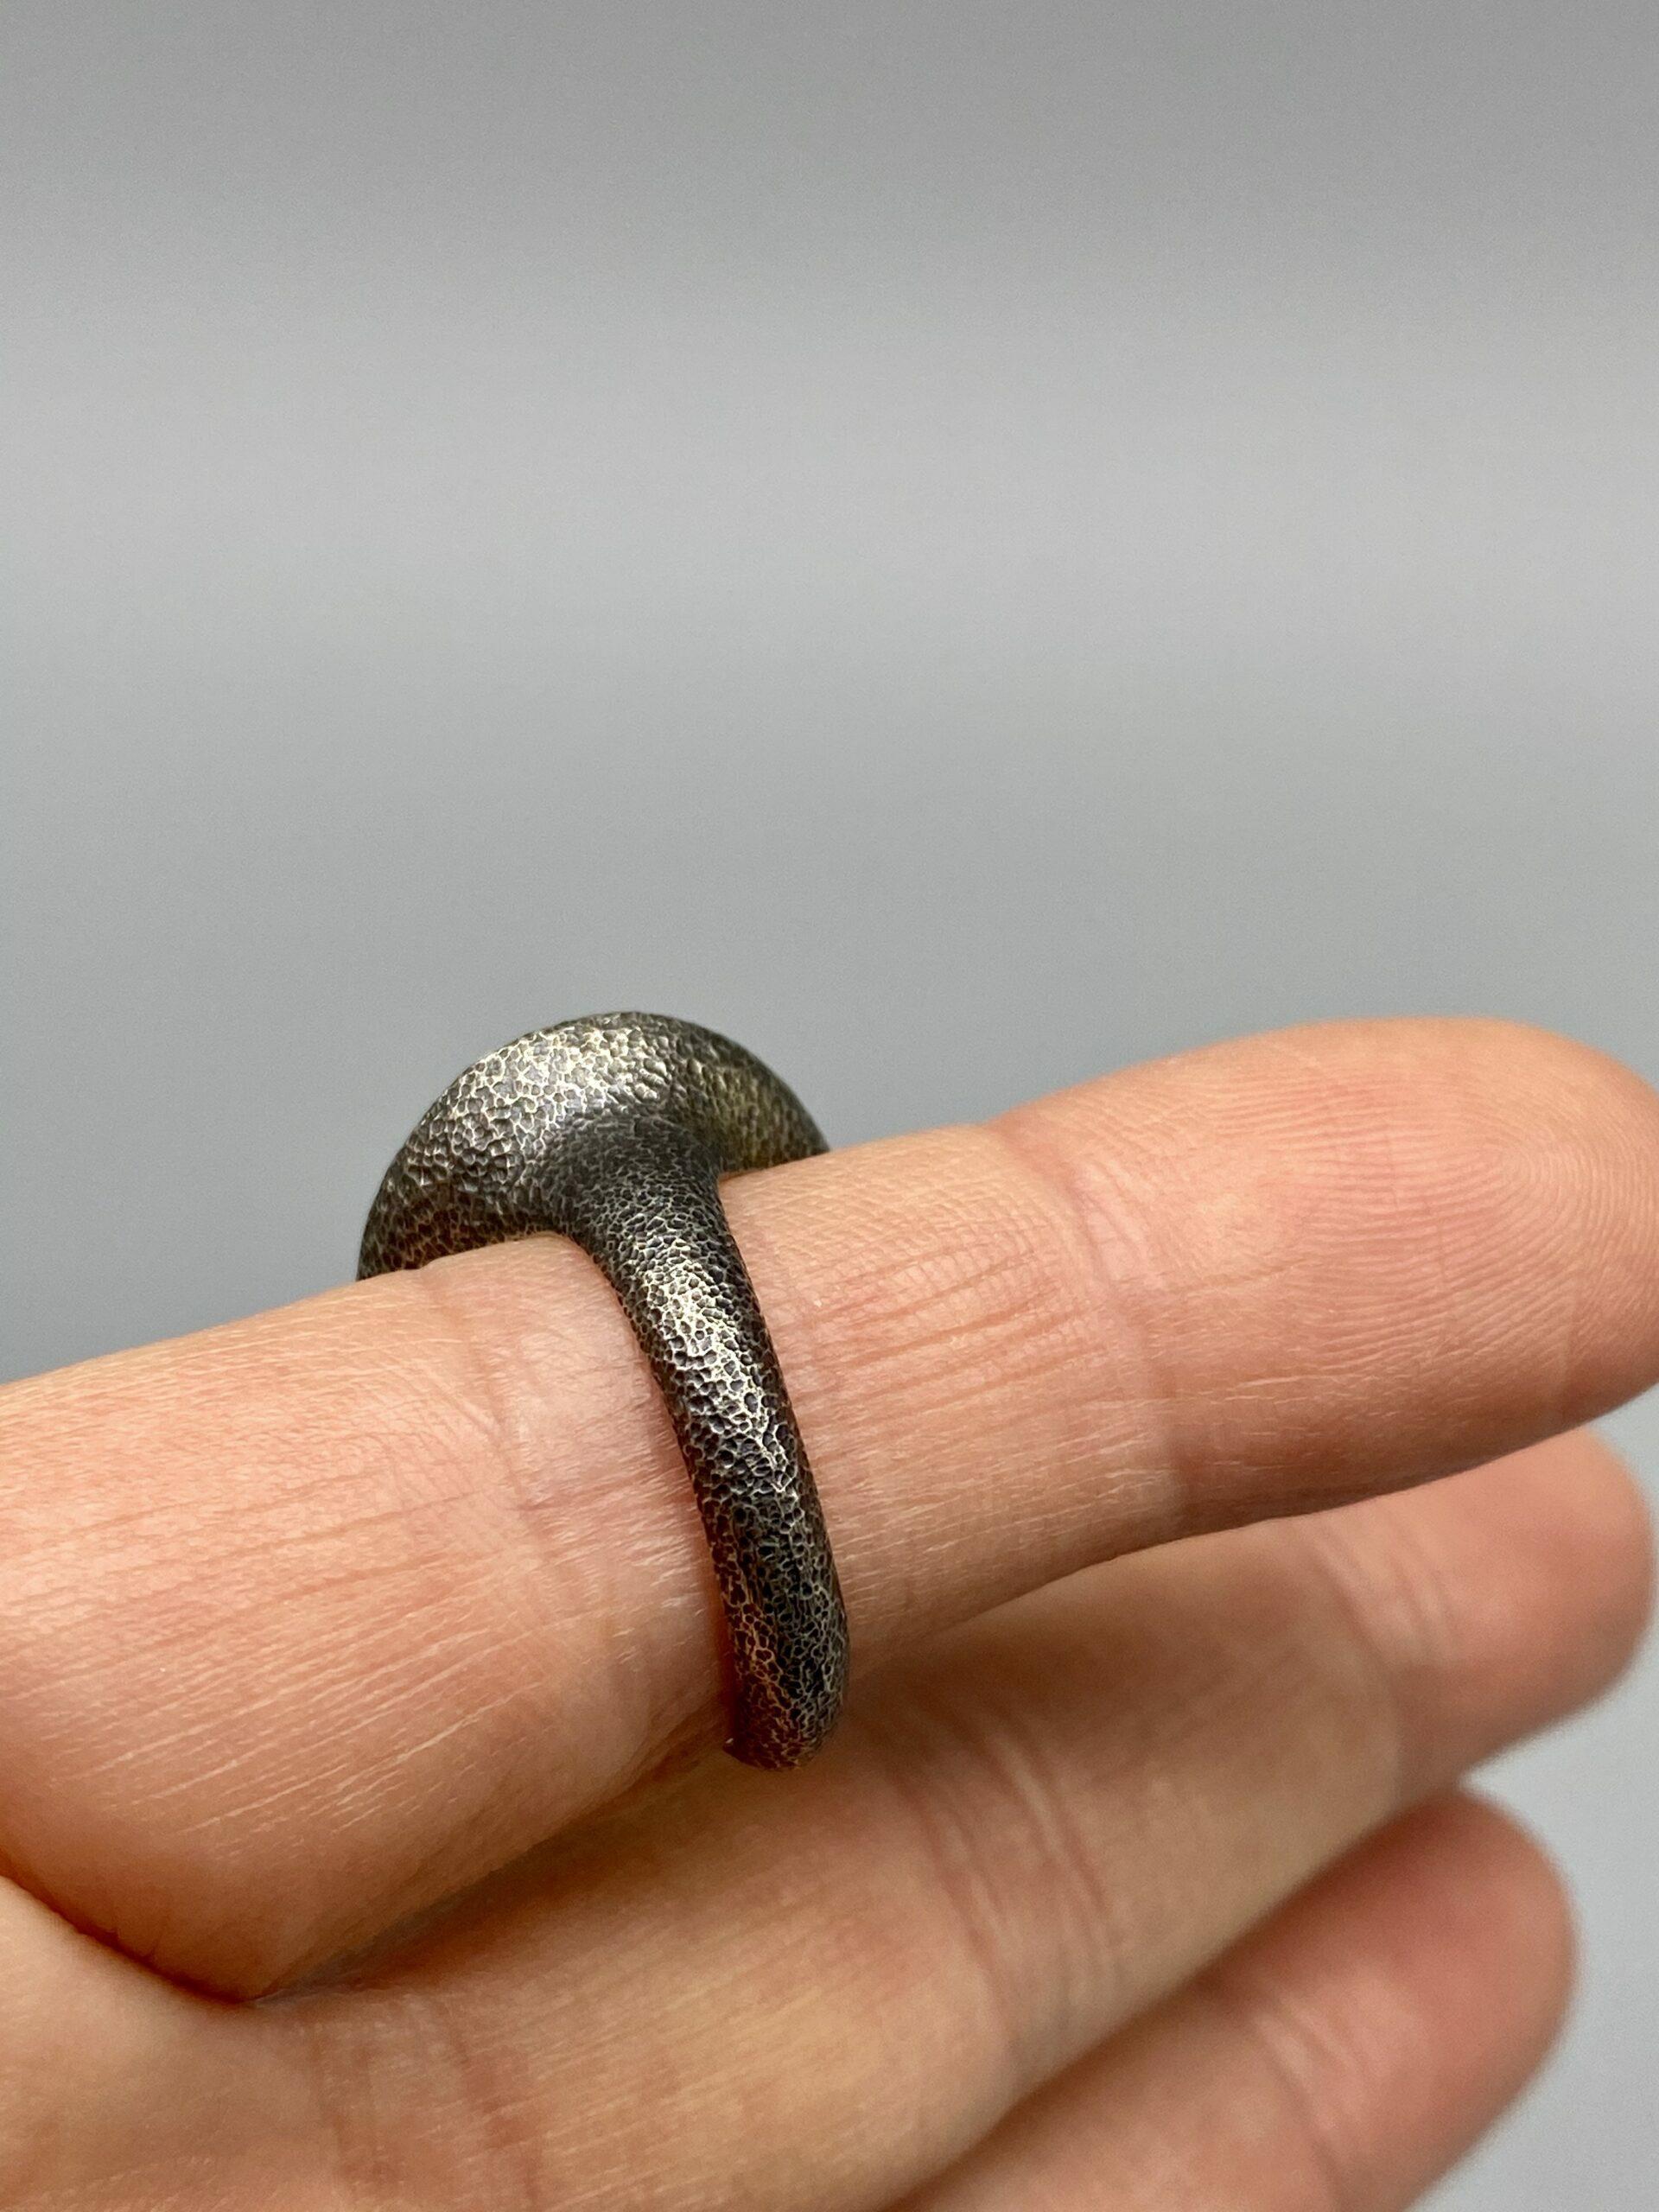 The Sirens All Seeing Eye Ring \u2022 Moonstone Eye Ring \u2022 Size 6